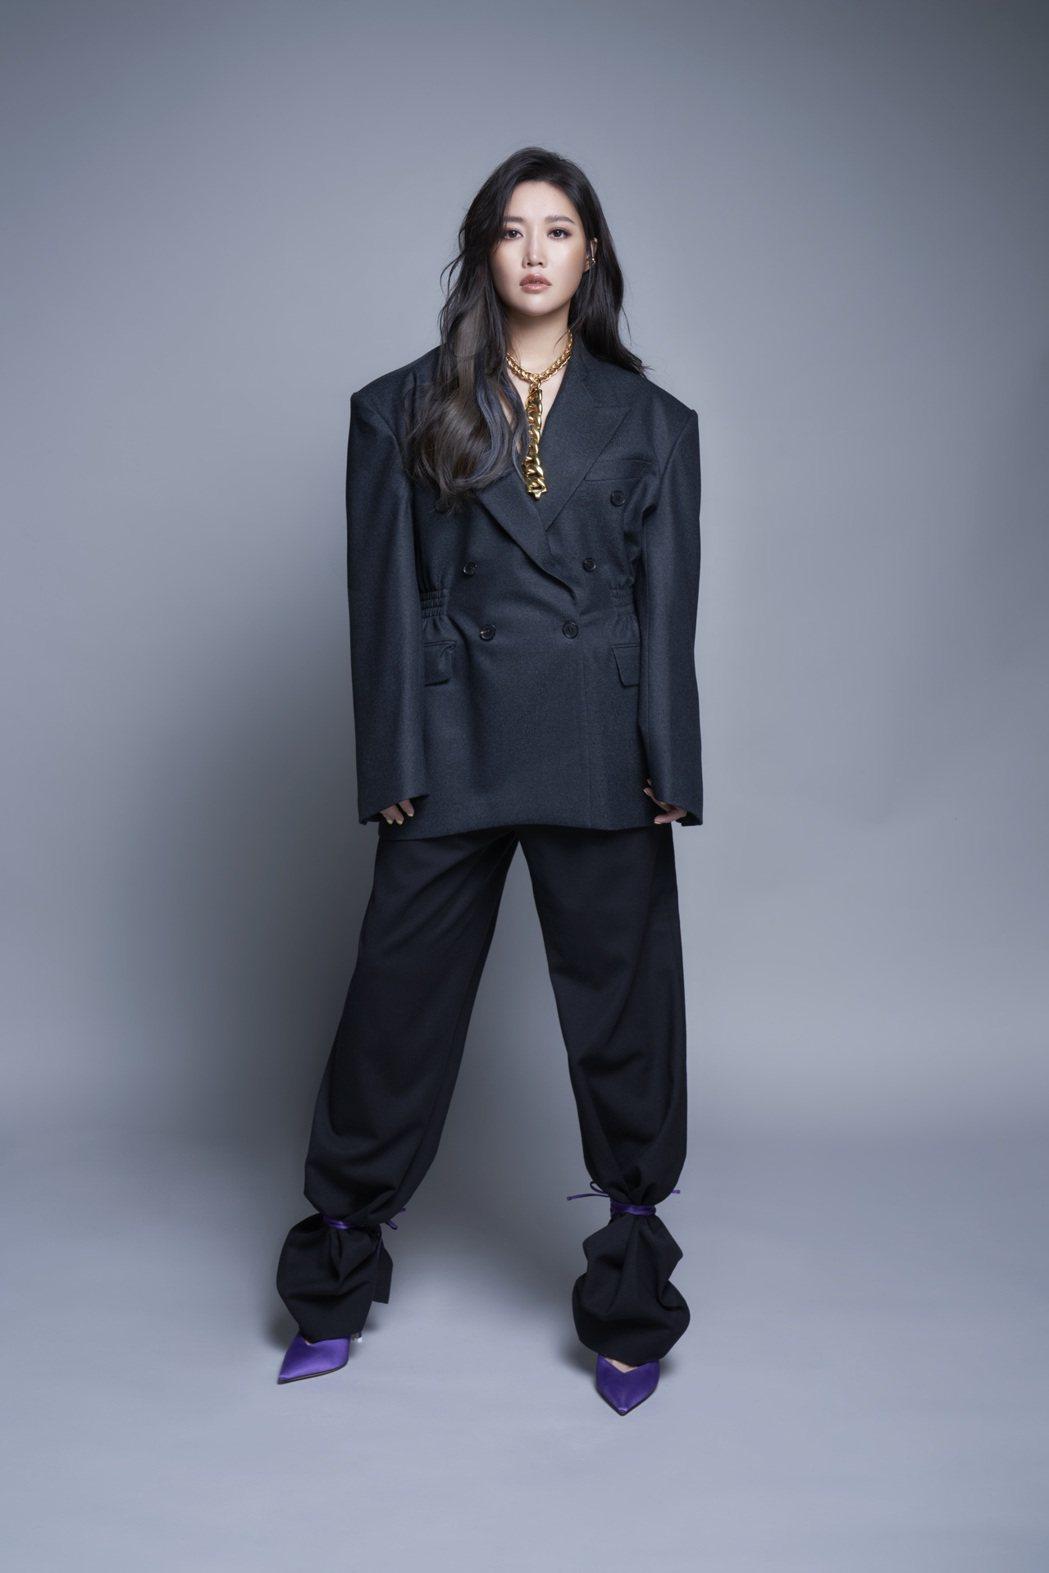 A-Lin將在12月唱進高雄巨蛋。圖/索尼音樂提供